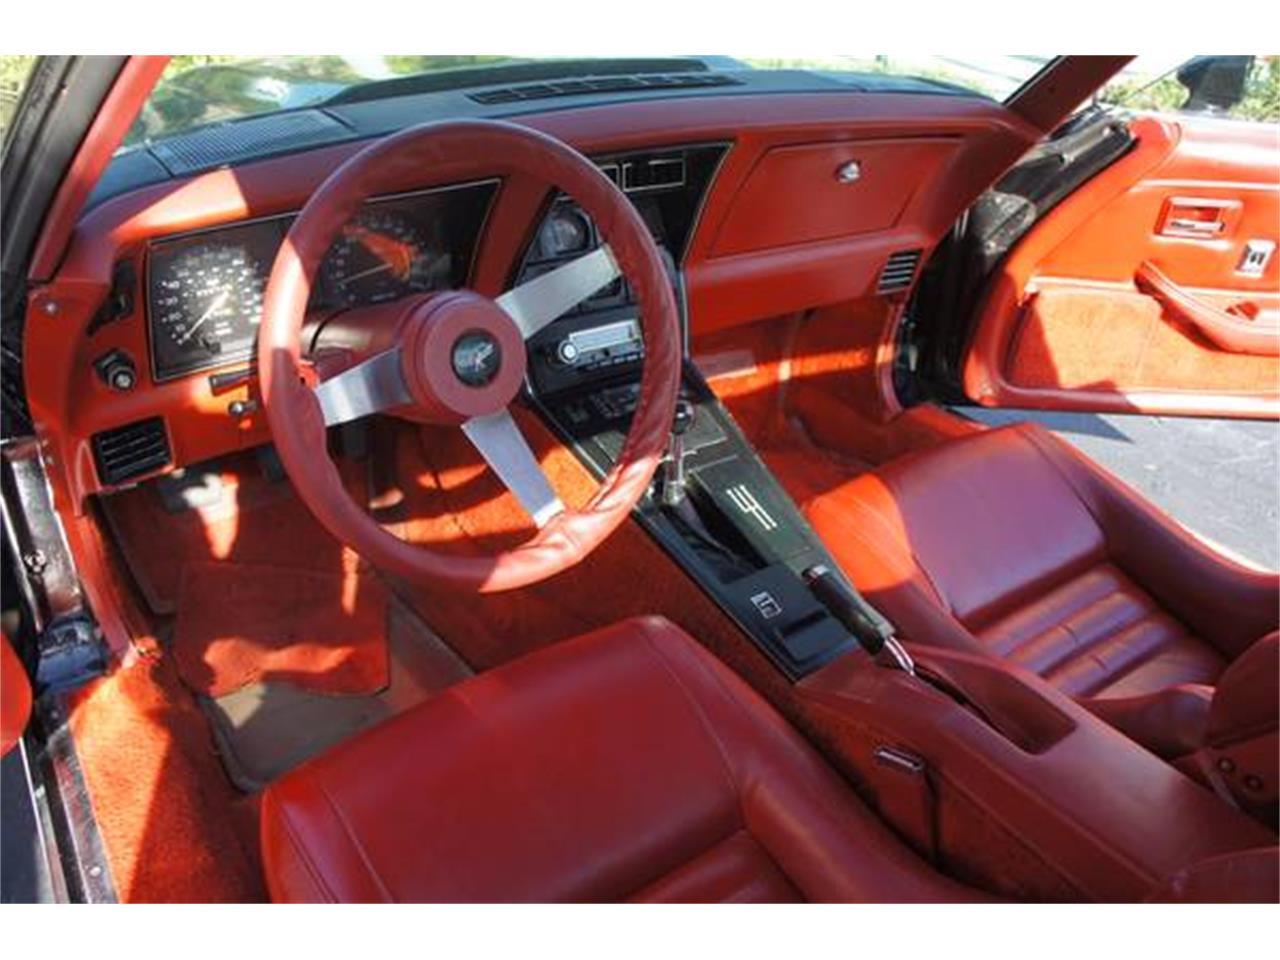 1979 Chevrolet Corvette (CC-1317724) for sale in Lantana, Florida